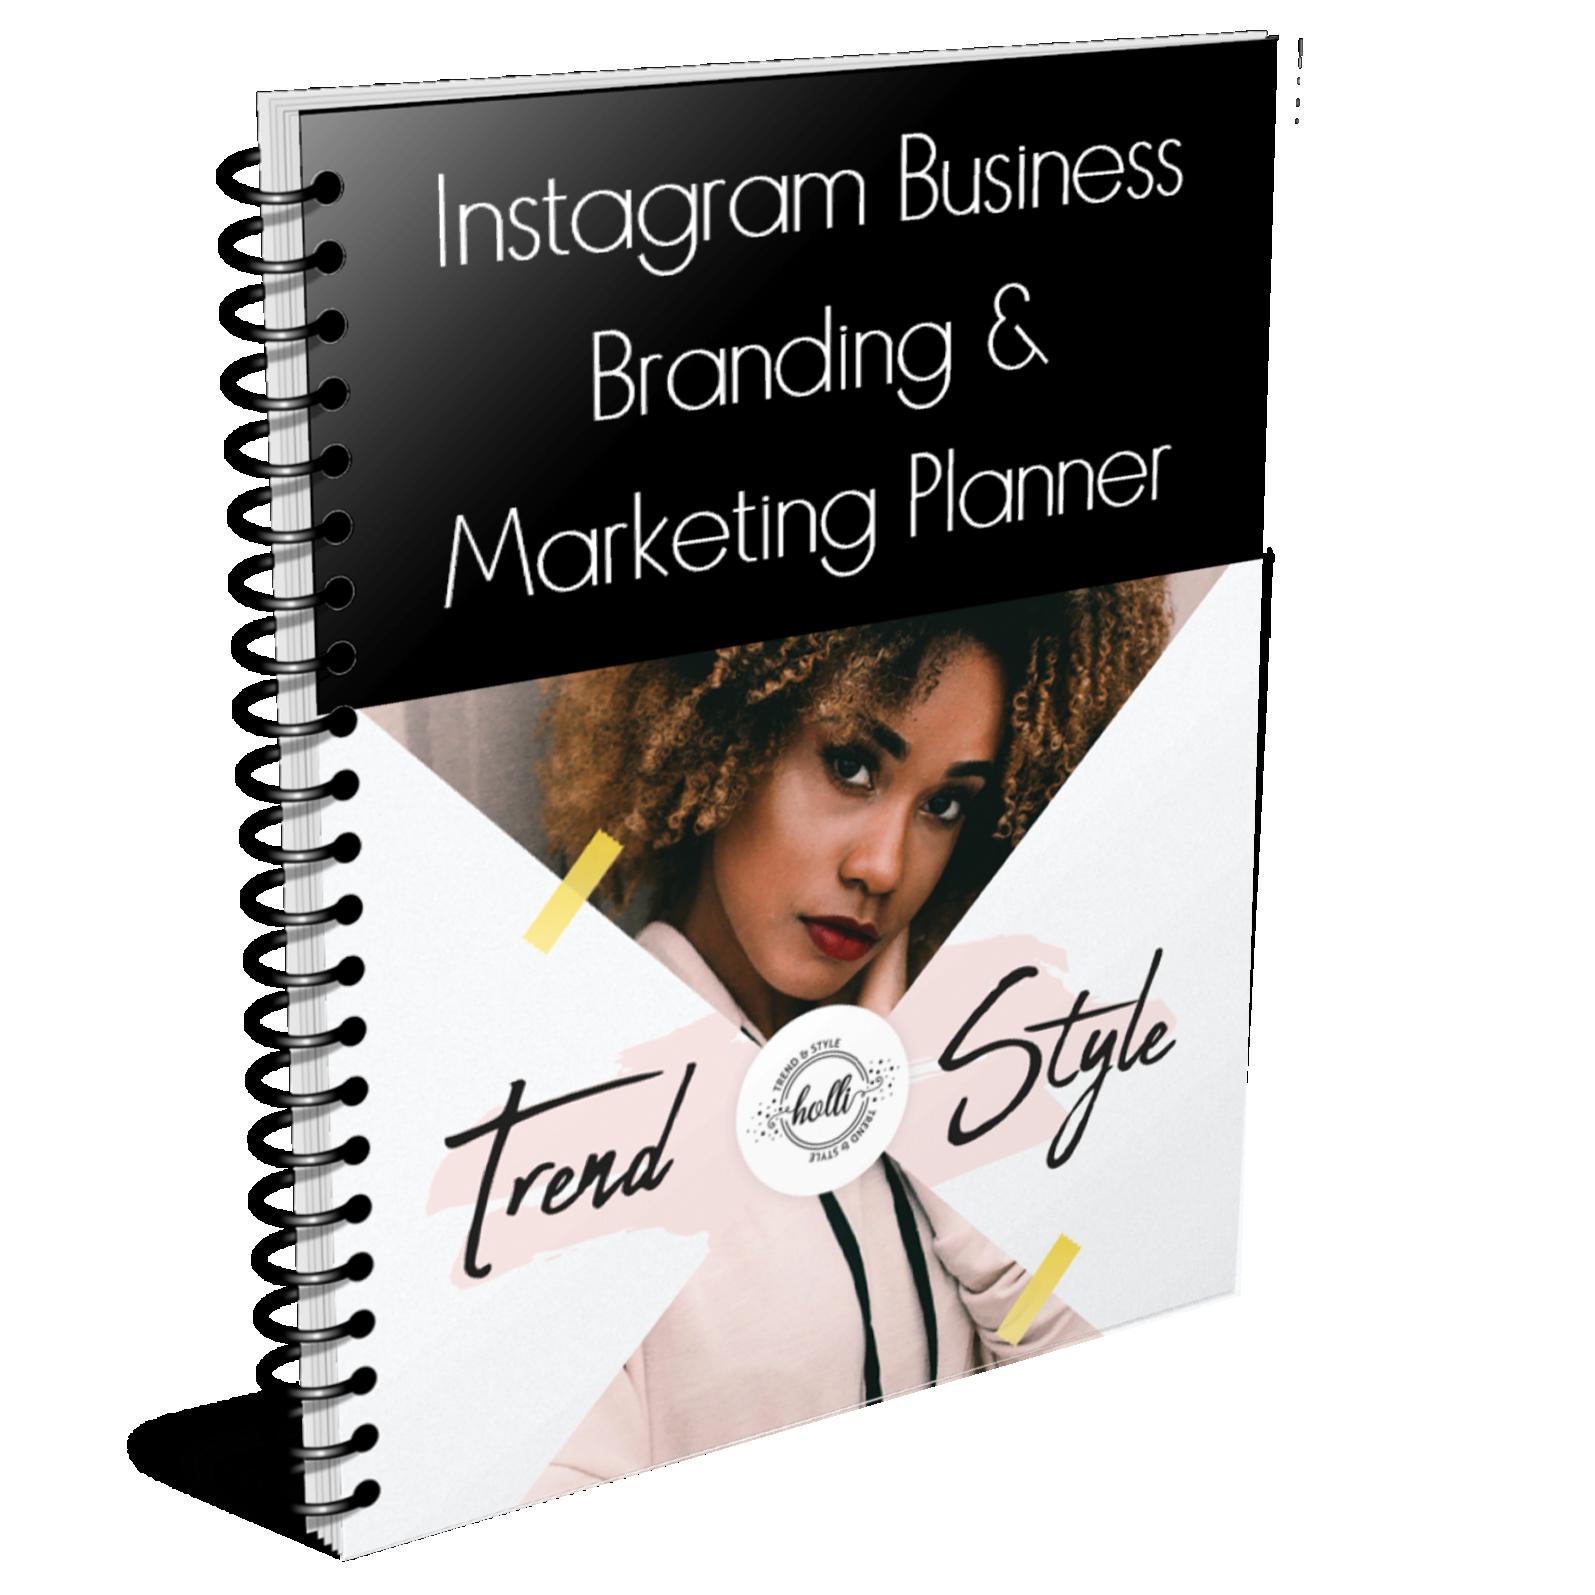 Instagram Business Branding & Marketing Planner